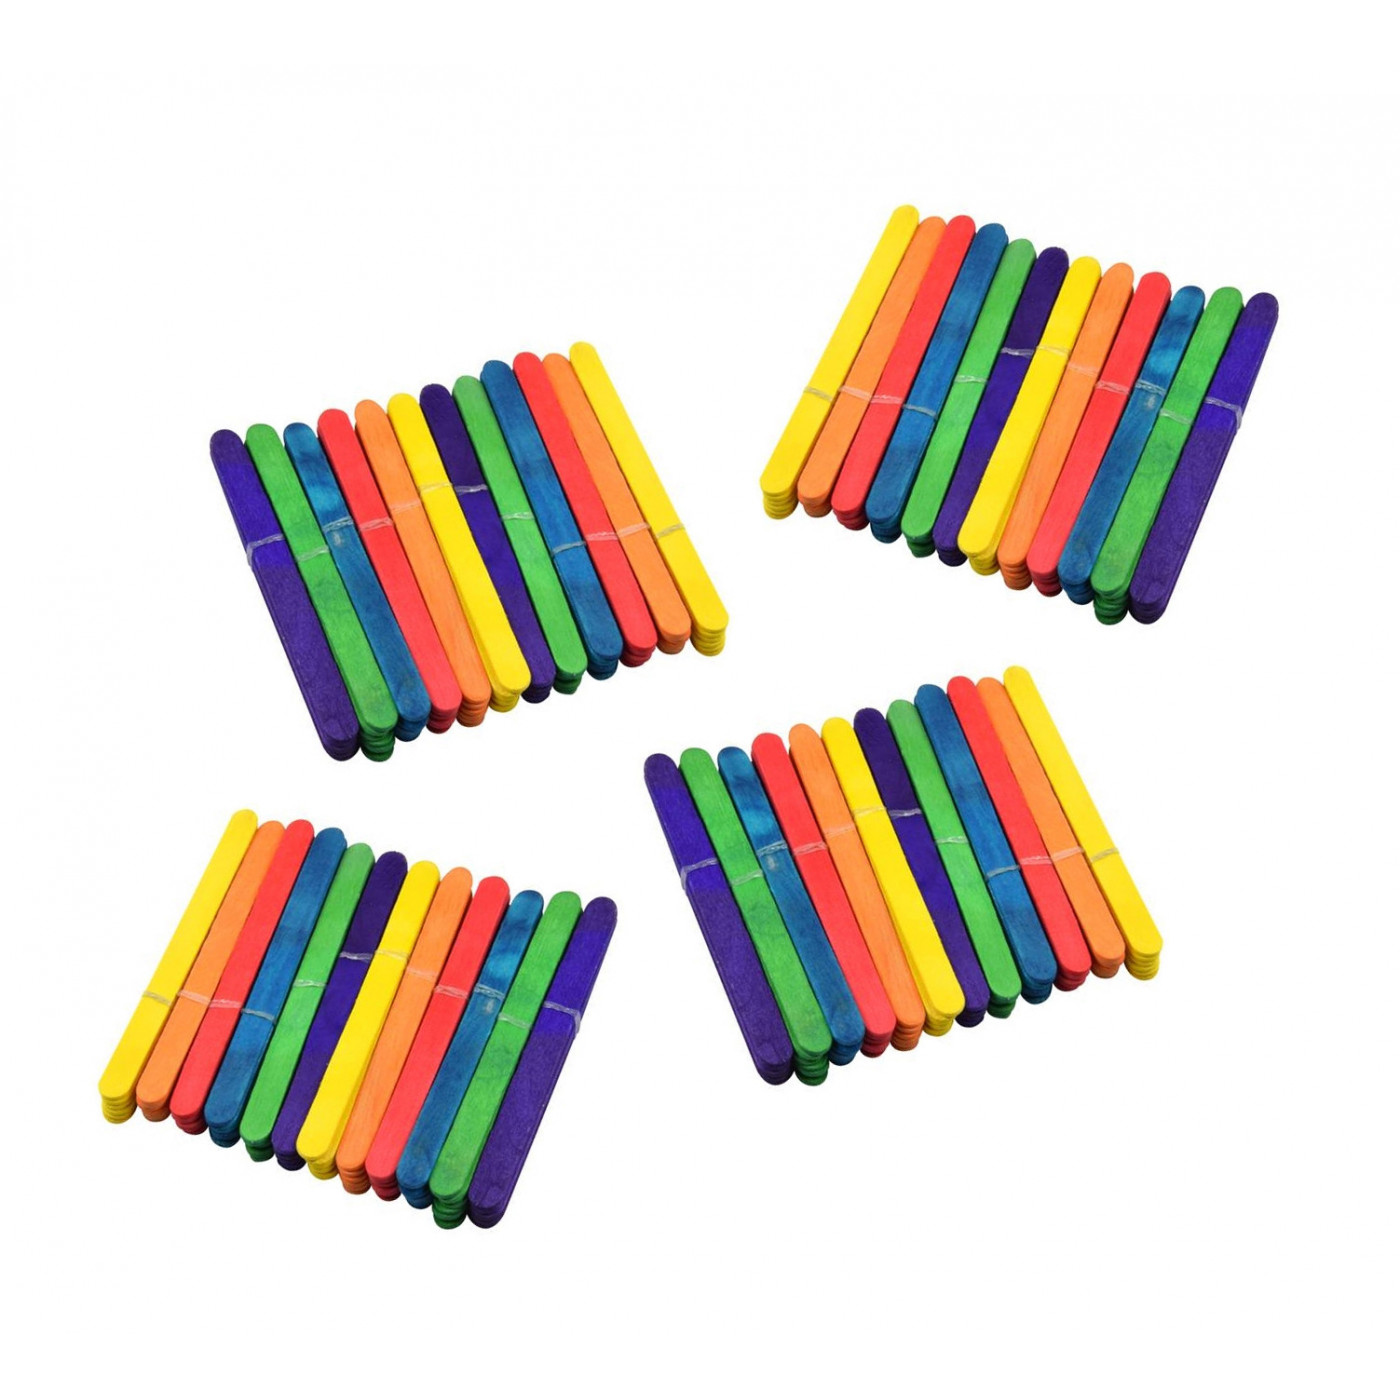 Set of 288 colored craft sticks (11 cm long, 1 cm wide)